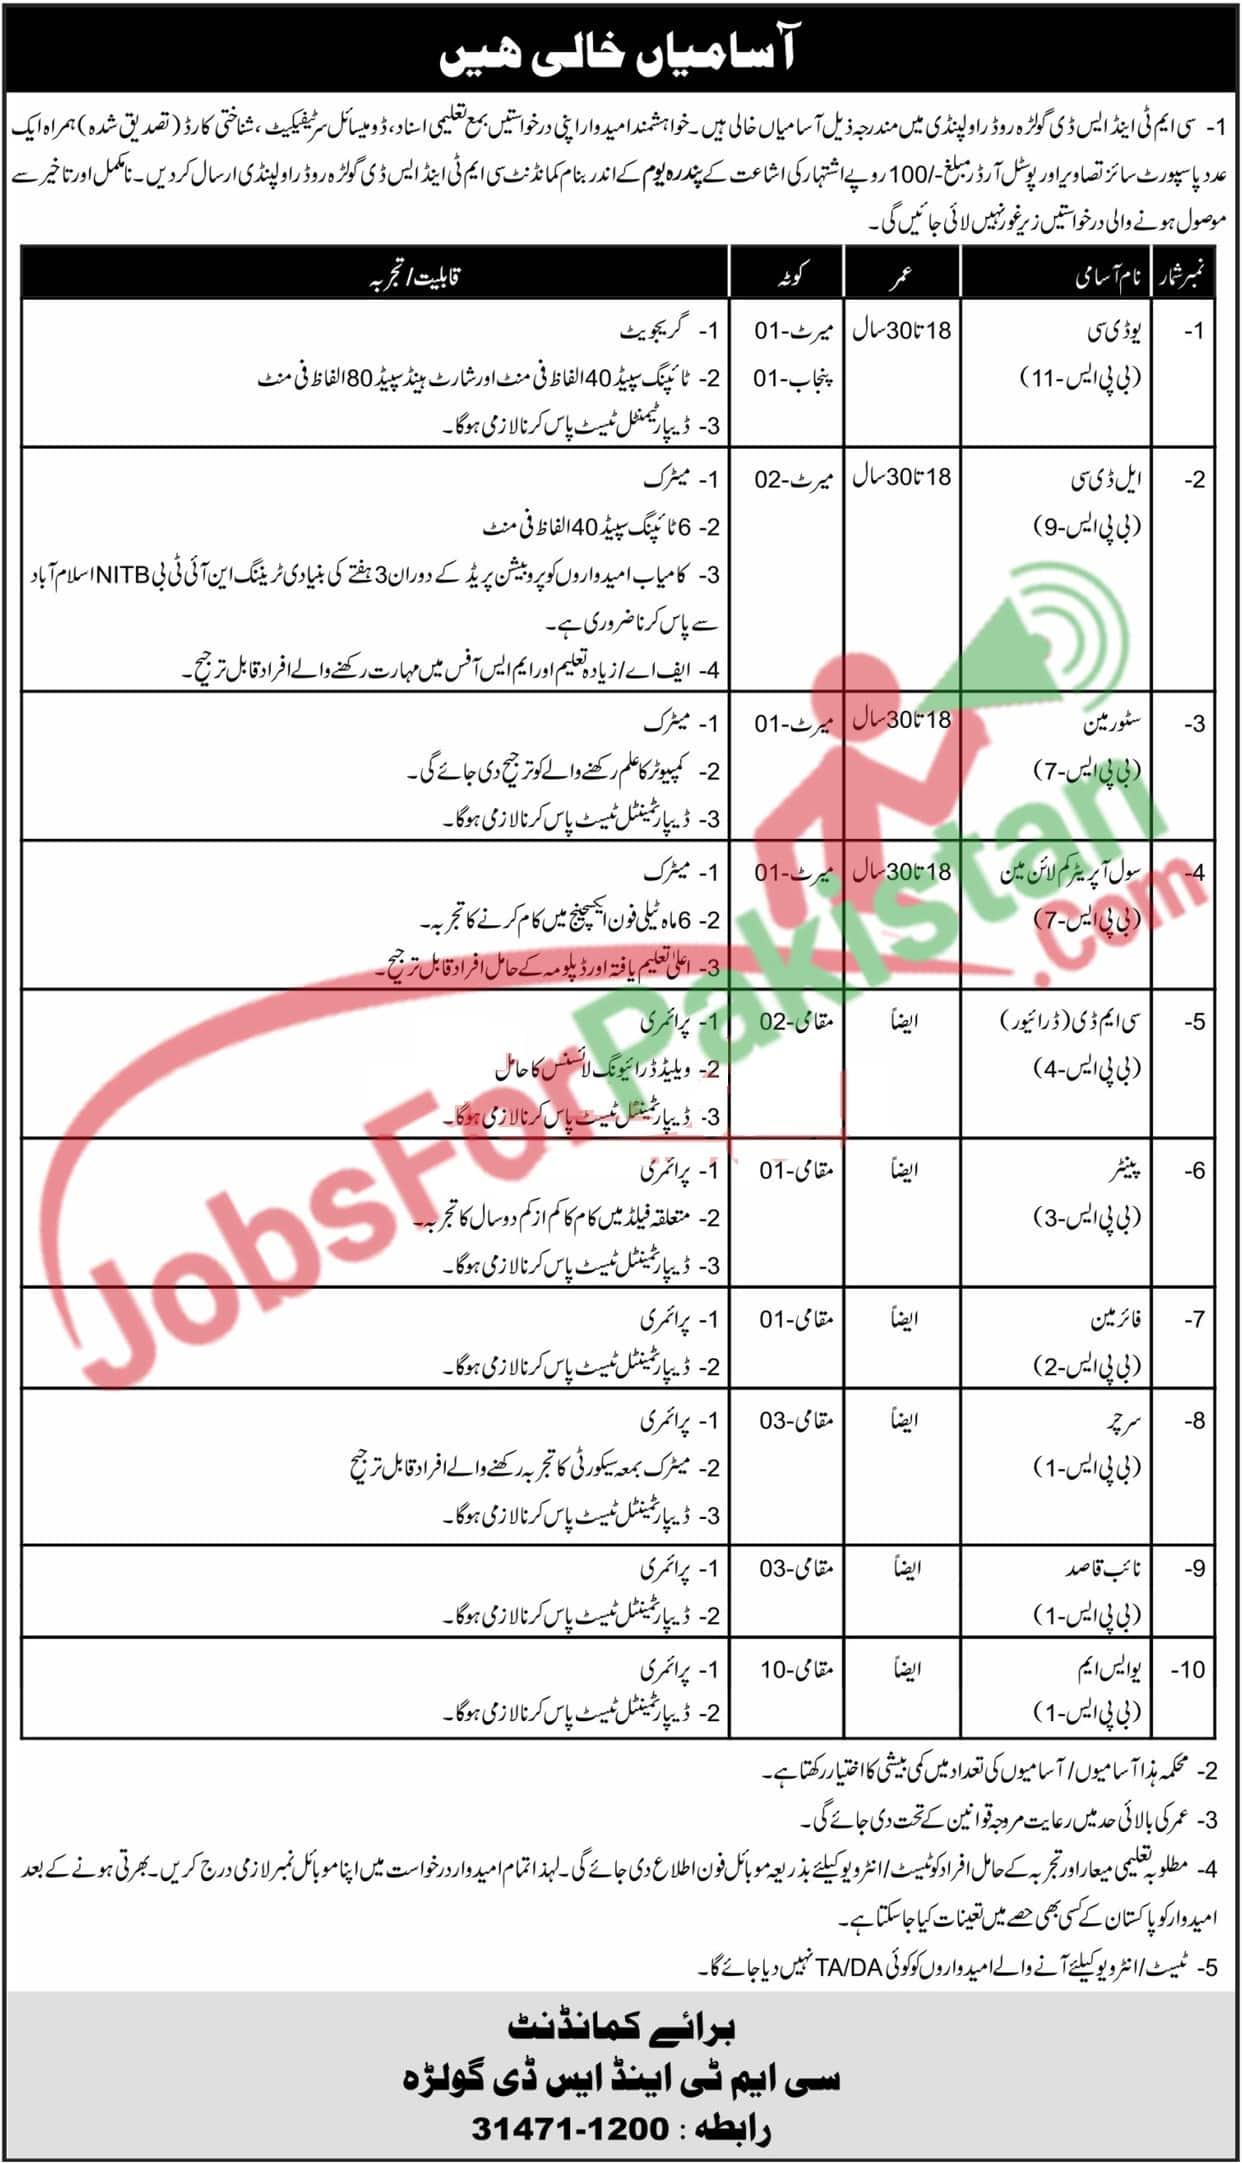 Army jobs Pakistan 2021